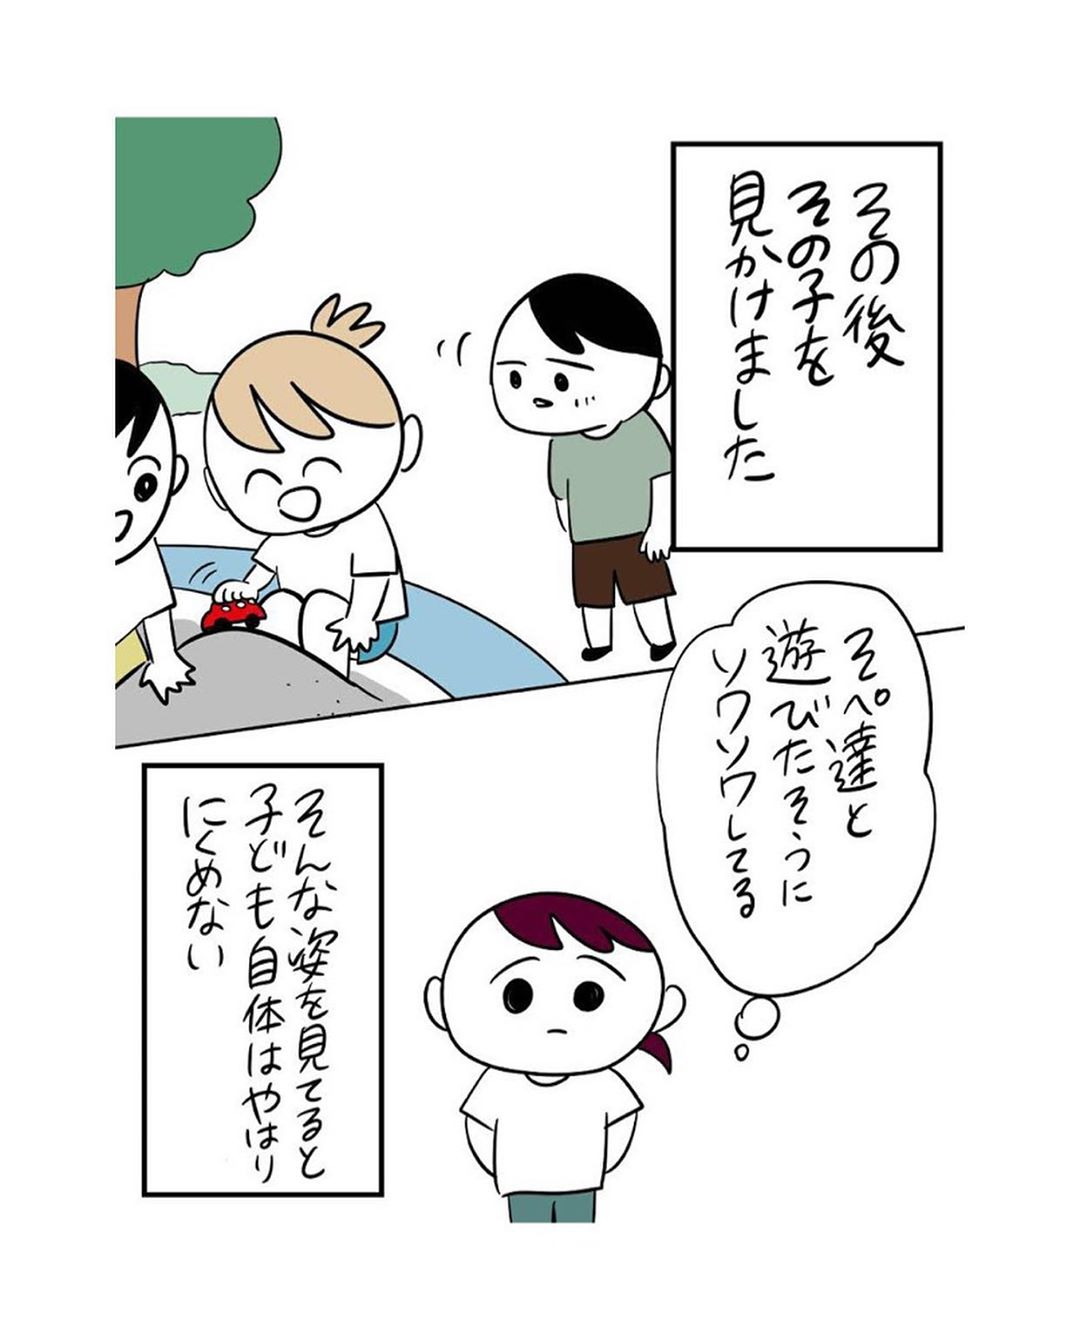 shirota.yunya_75225404_2464901743622490_7362544574948660249_n